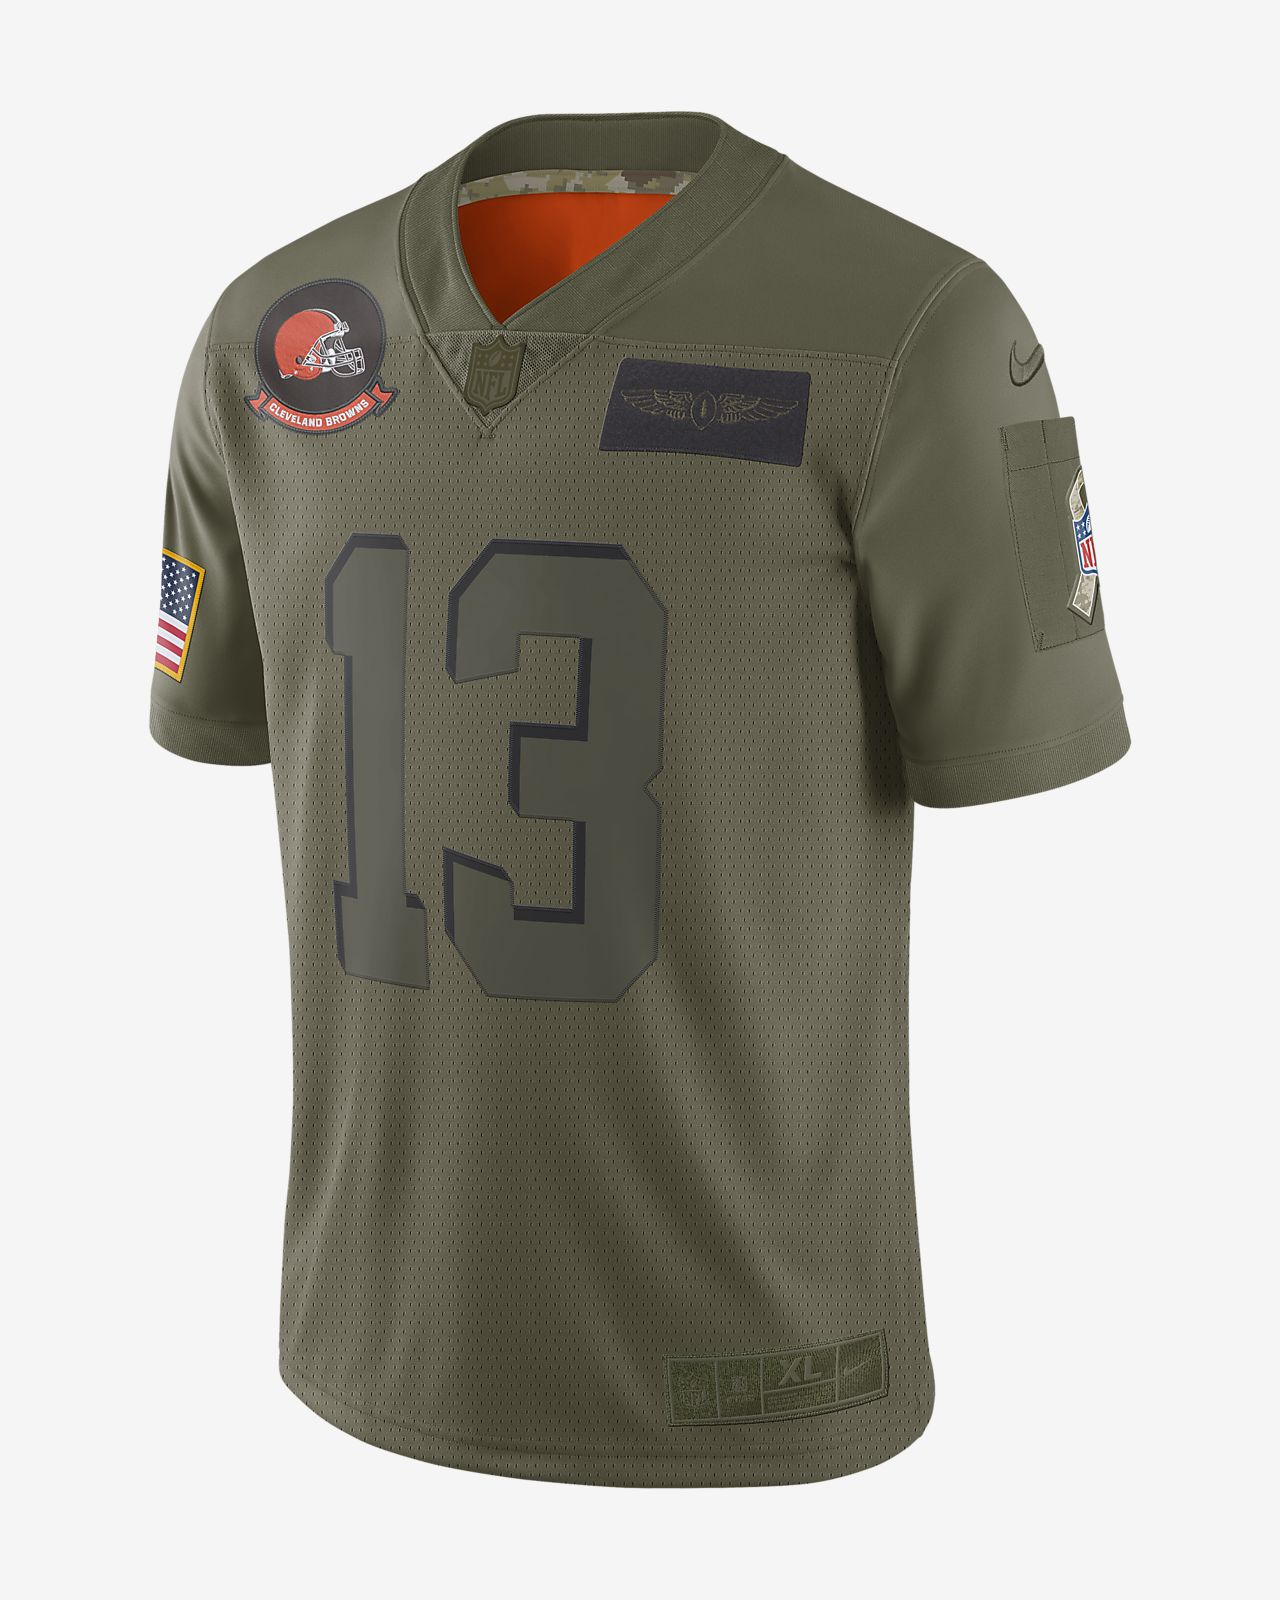 NFL Cleveland Browns Limited Salute To Service (Odell Beckham Jr.) Men's Football Jersey